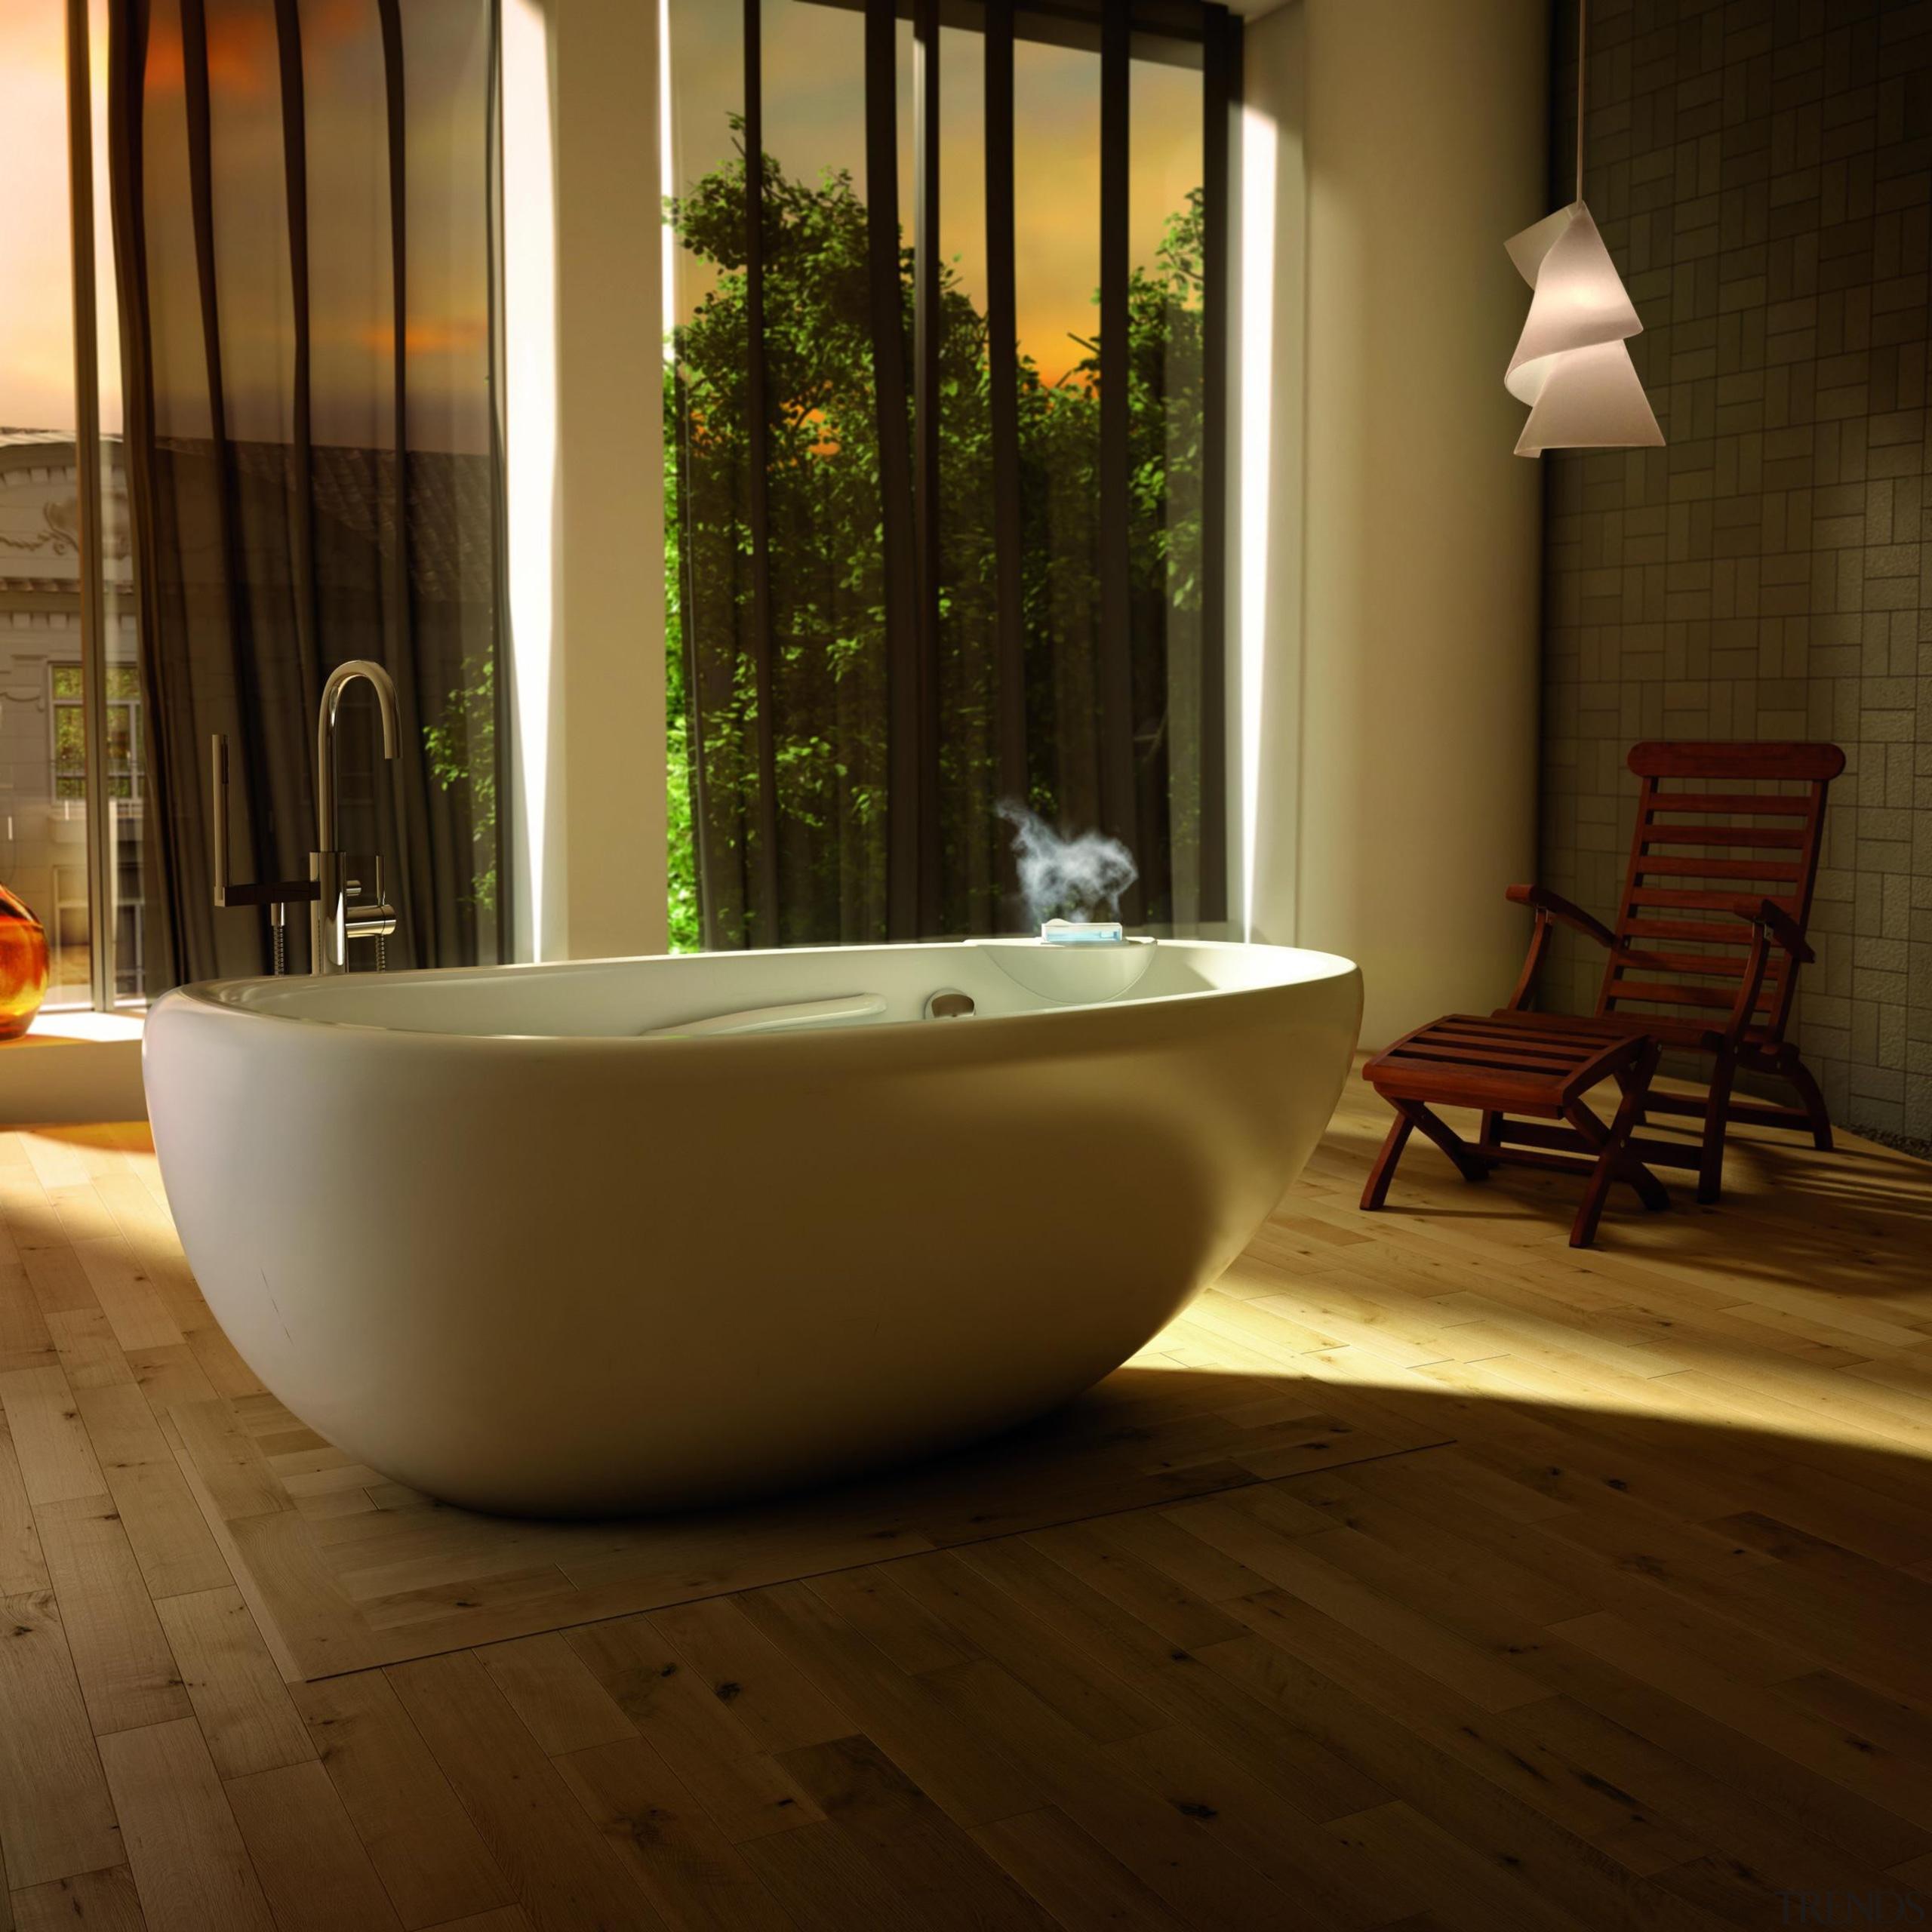 essencial oval thermasens.jpg - essencial_oval_thermasens.jpg - bathroom | bathroom, bathtub, floor, flooring, hardwood, interior design, plumbing fixture, room, tile, wood flooring, brown